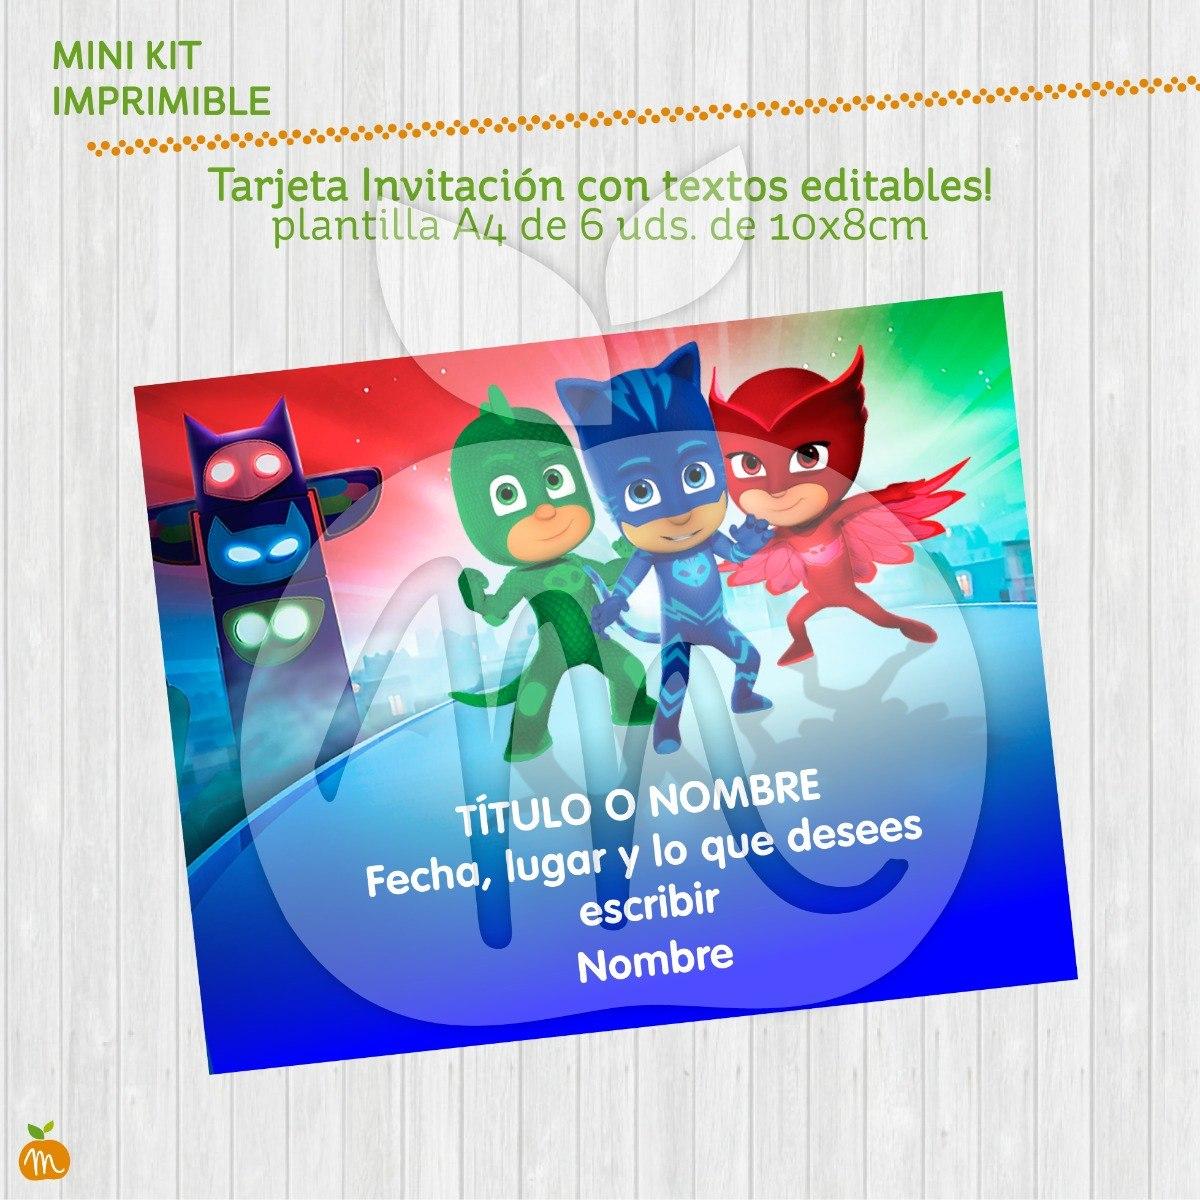 Tarjeta Invita Imprimible Cumpleaños Pjmasks Heroes Pijamas